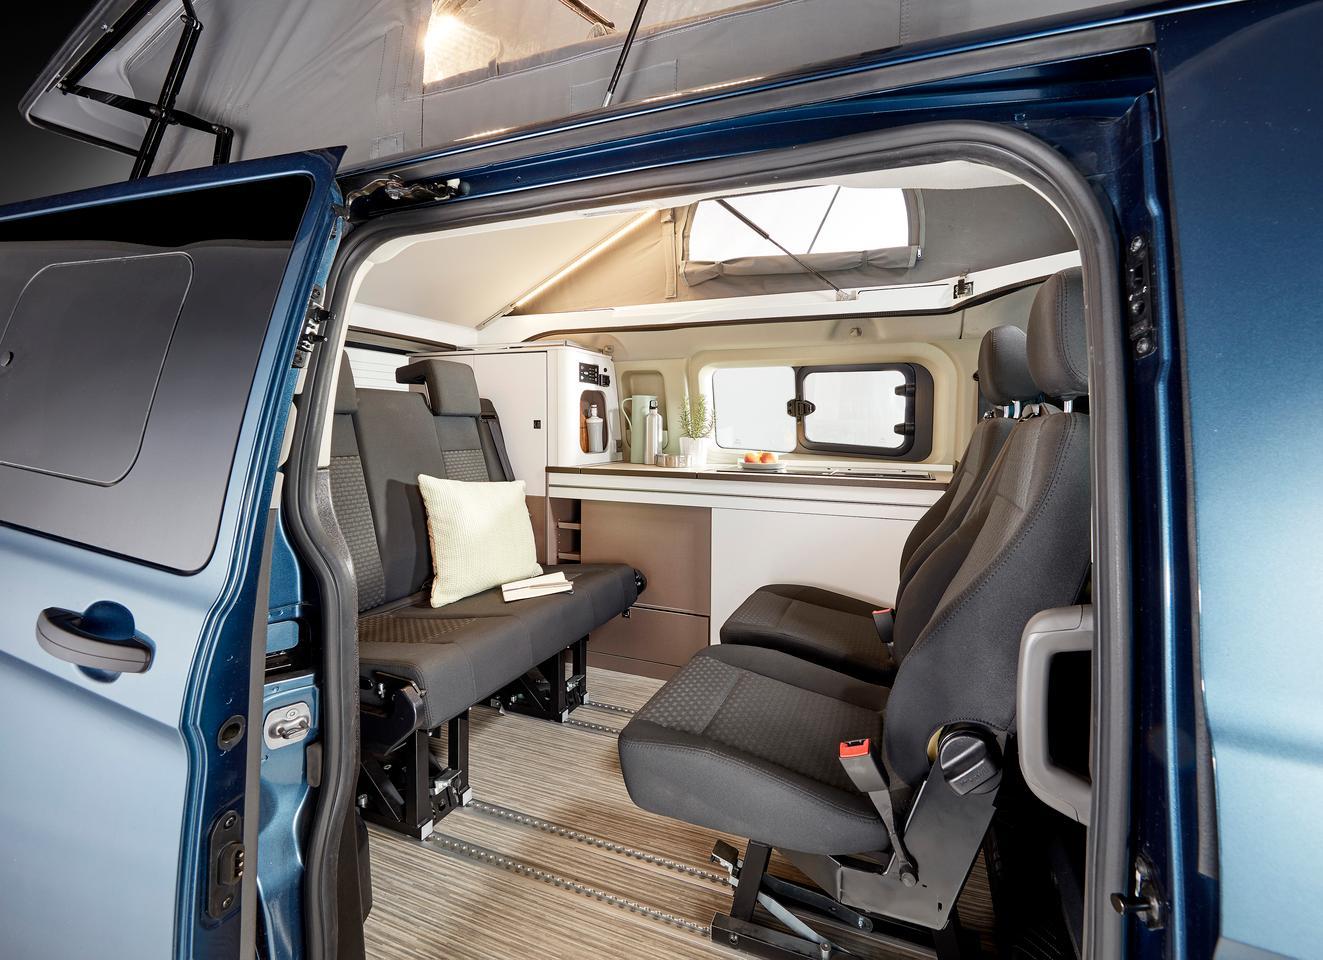 , [:en]Bürstner makes Ford van a versatile mini-camper multitool[:], Laban Juan